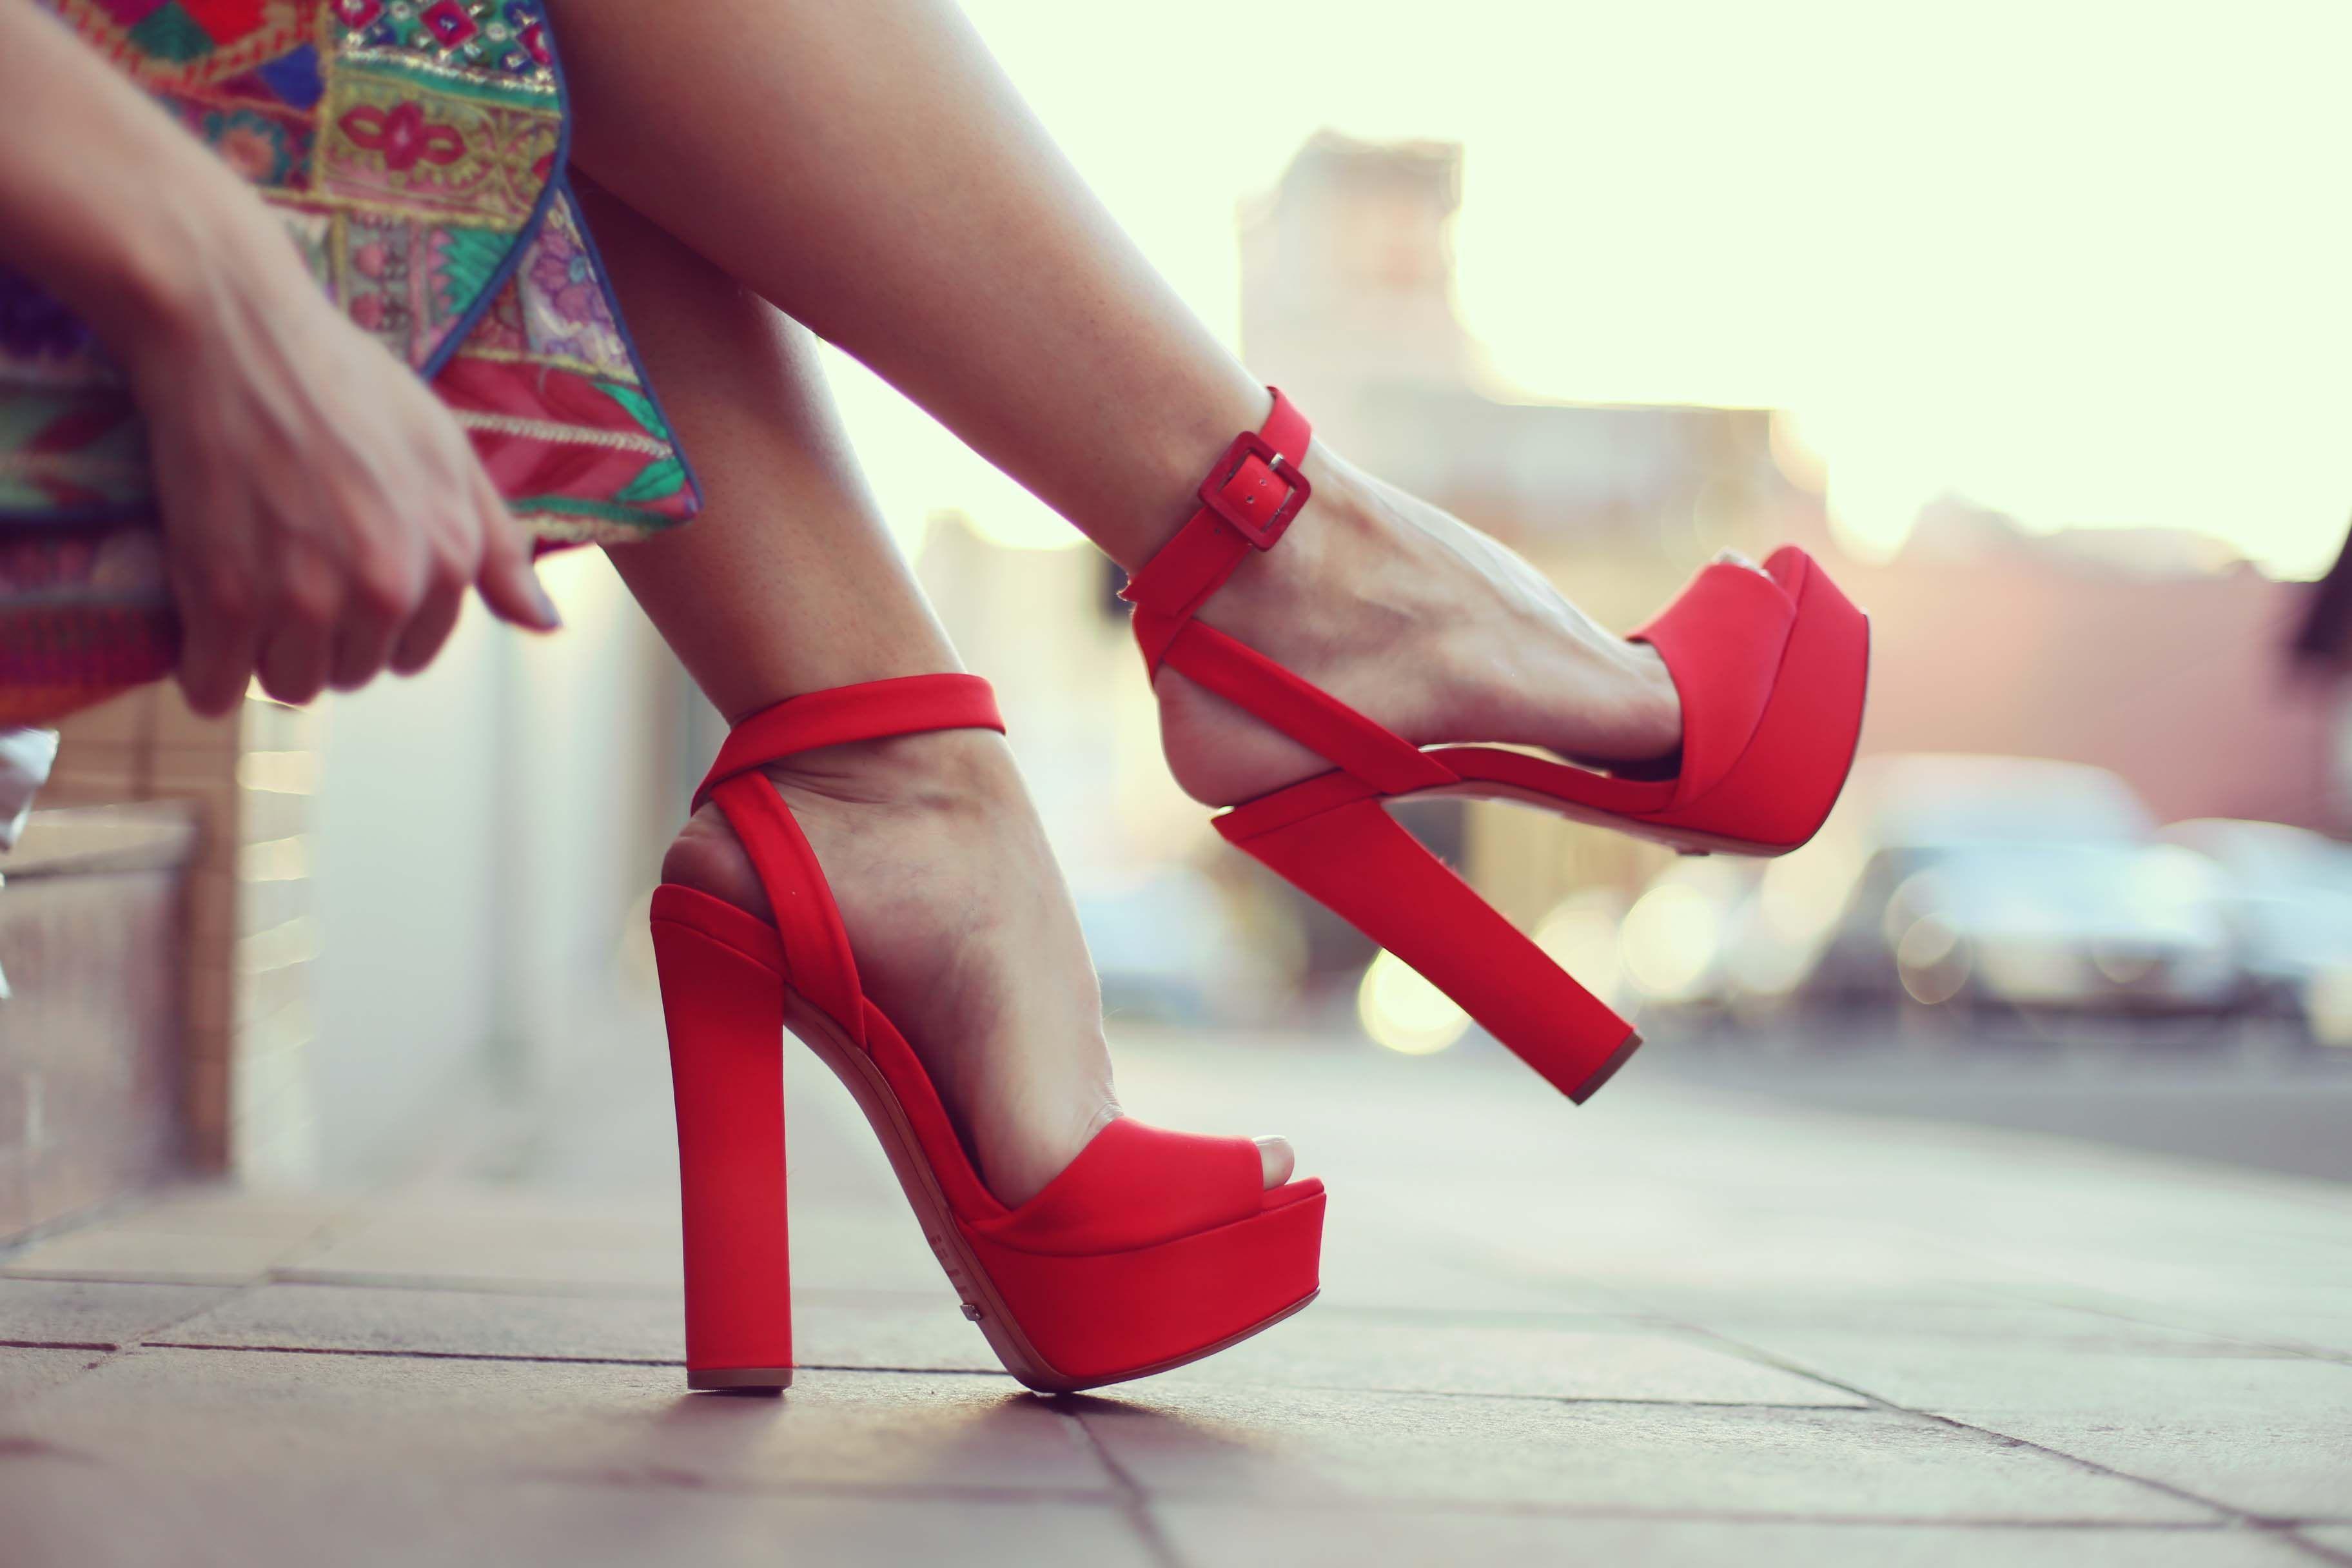 sandalia vermelha - Google Search